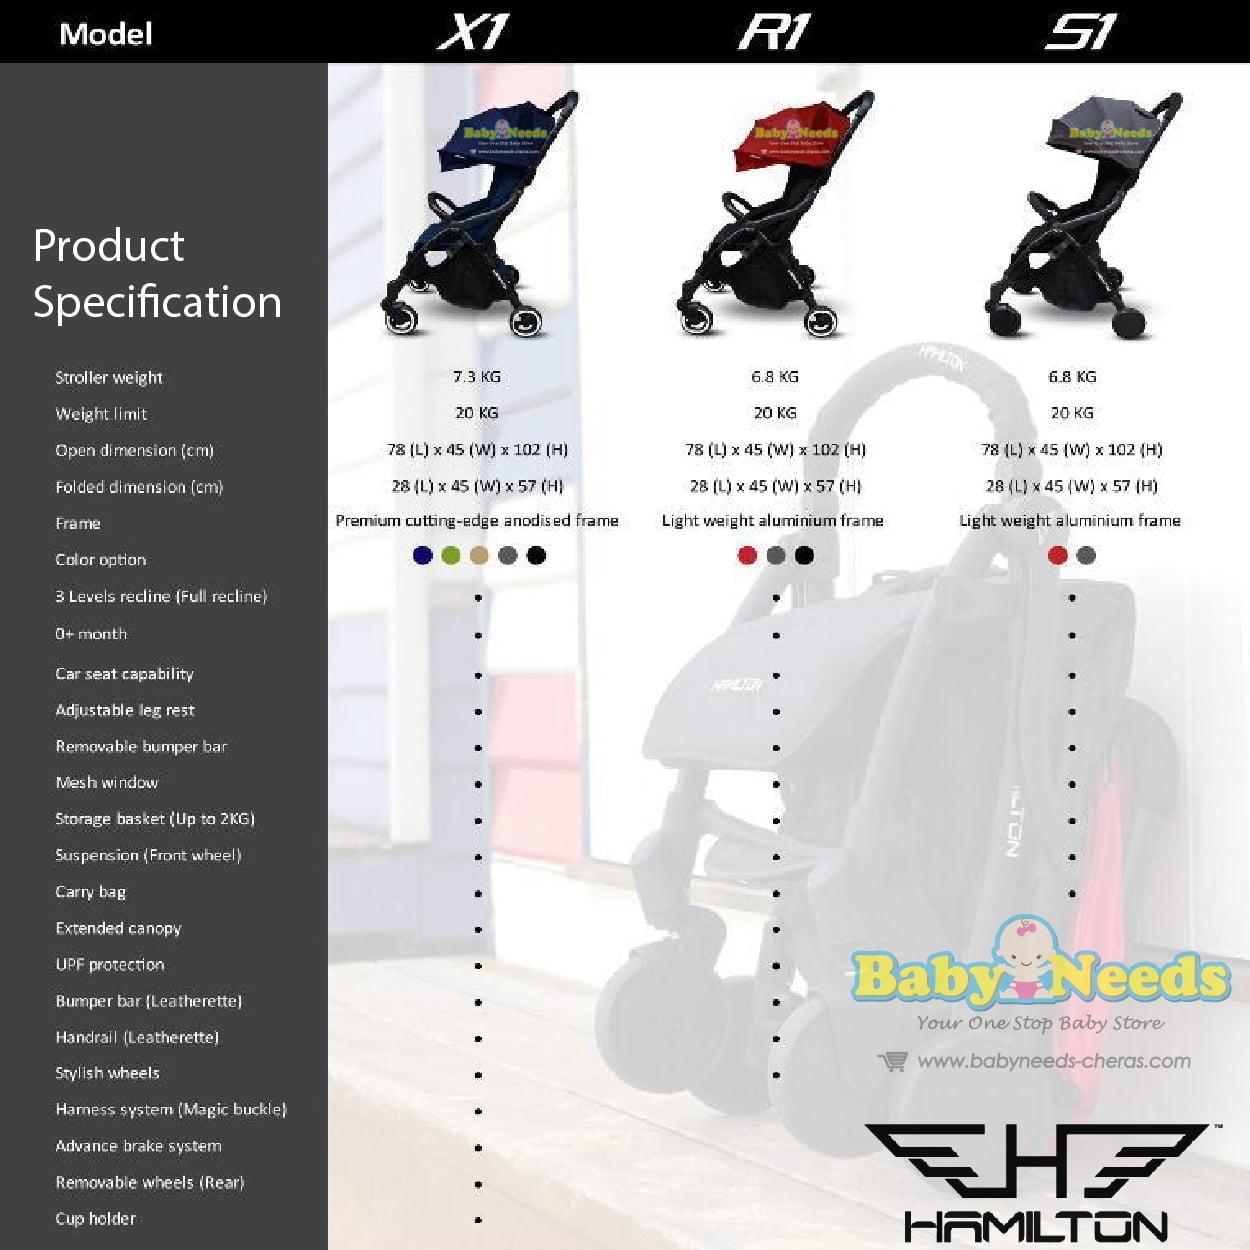 Hamilton : Series X1 Magic Fold Baby Stroller   Baby Needs ...